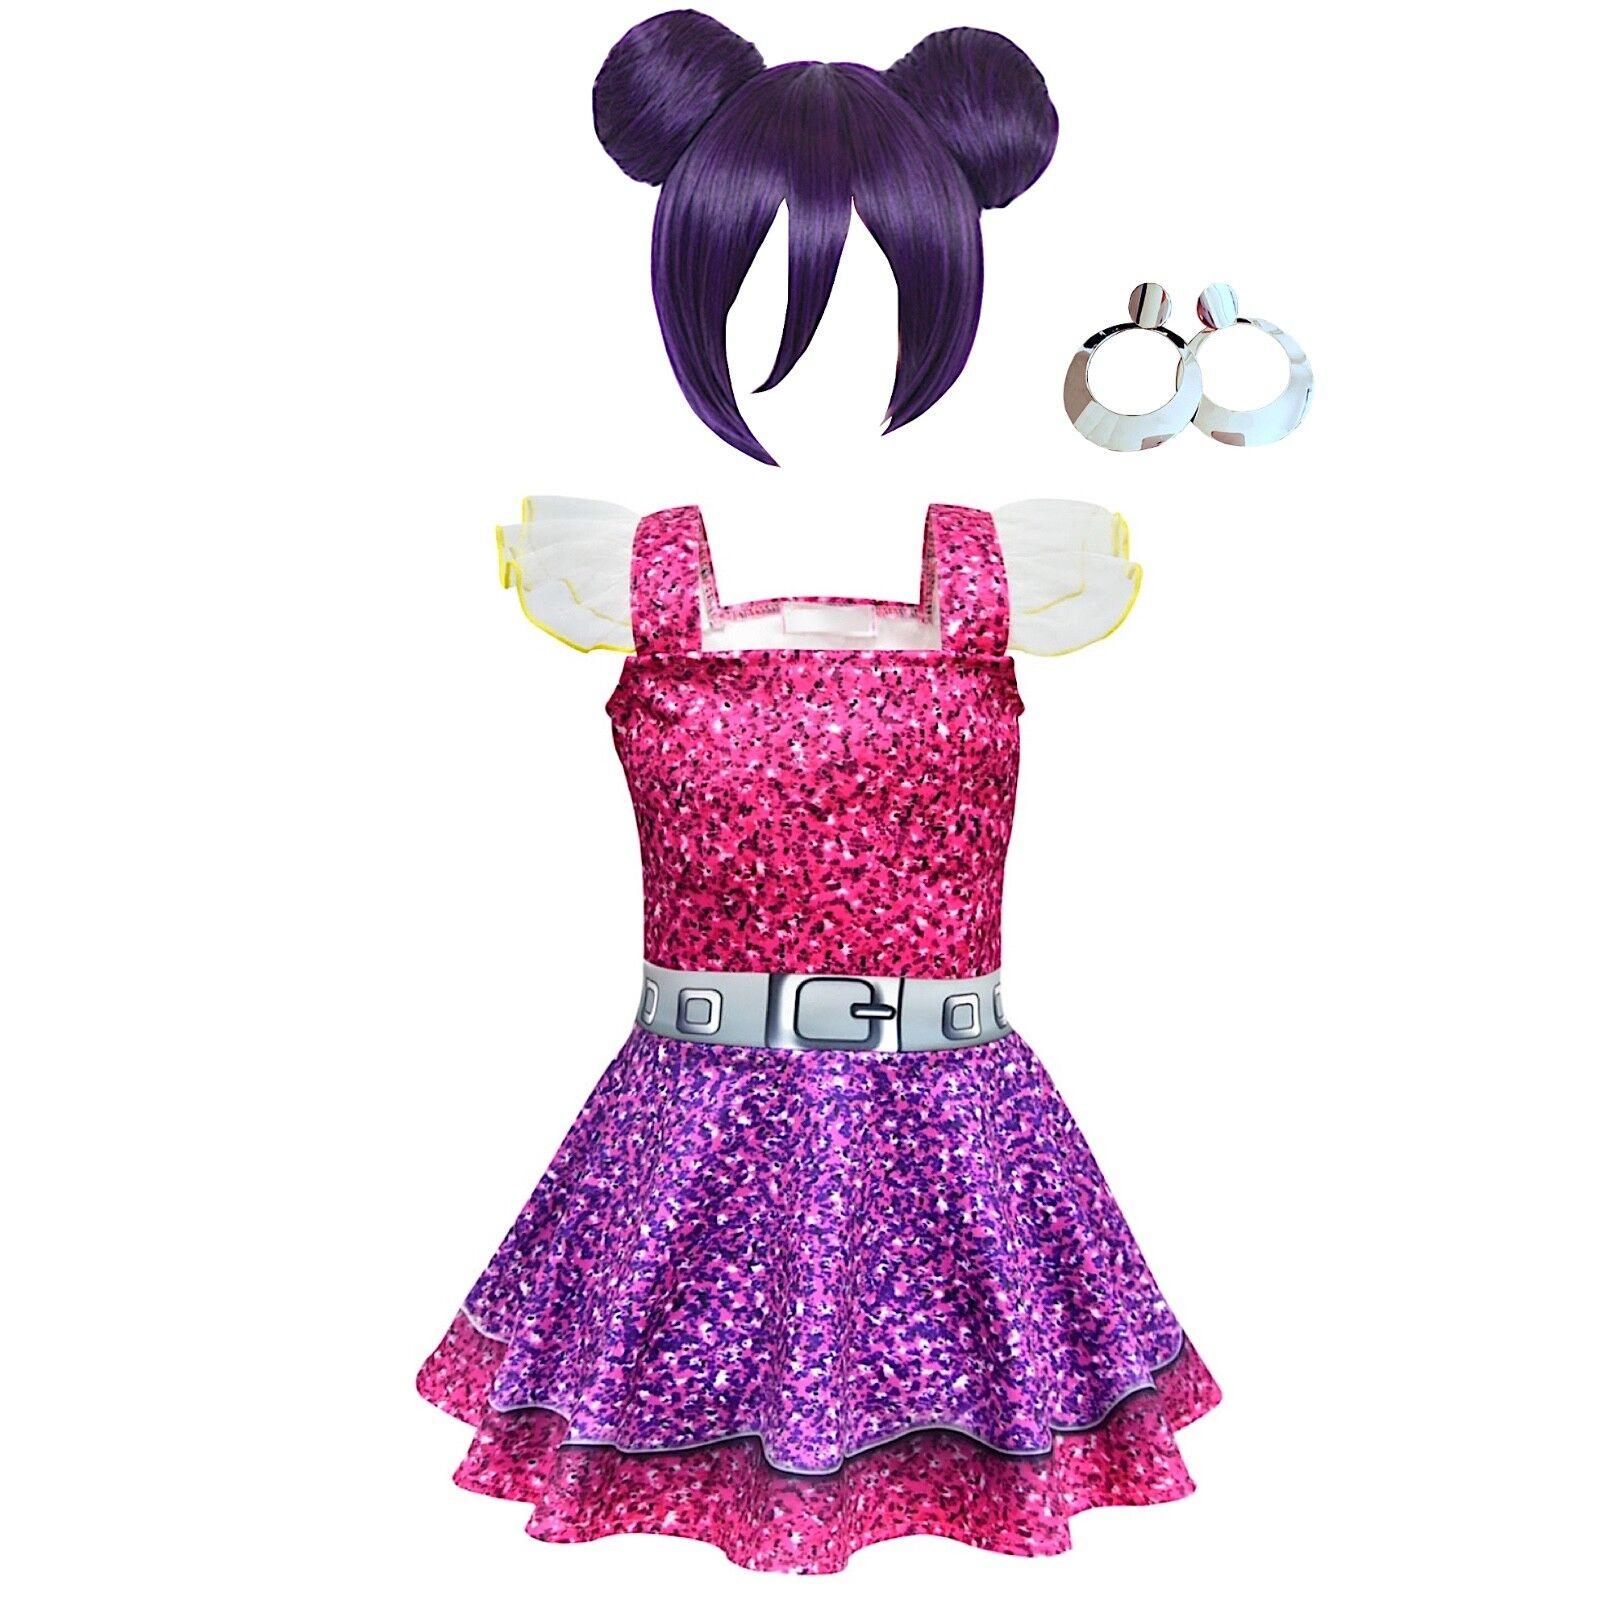 Miraculous Ladybug kid Girl Fancy Dress Cosplay  Bag ACCESSORI 4 PEZZI giochi